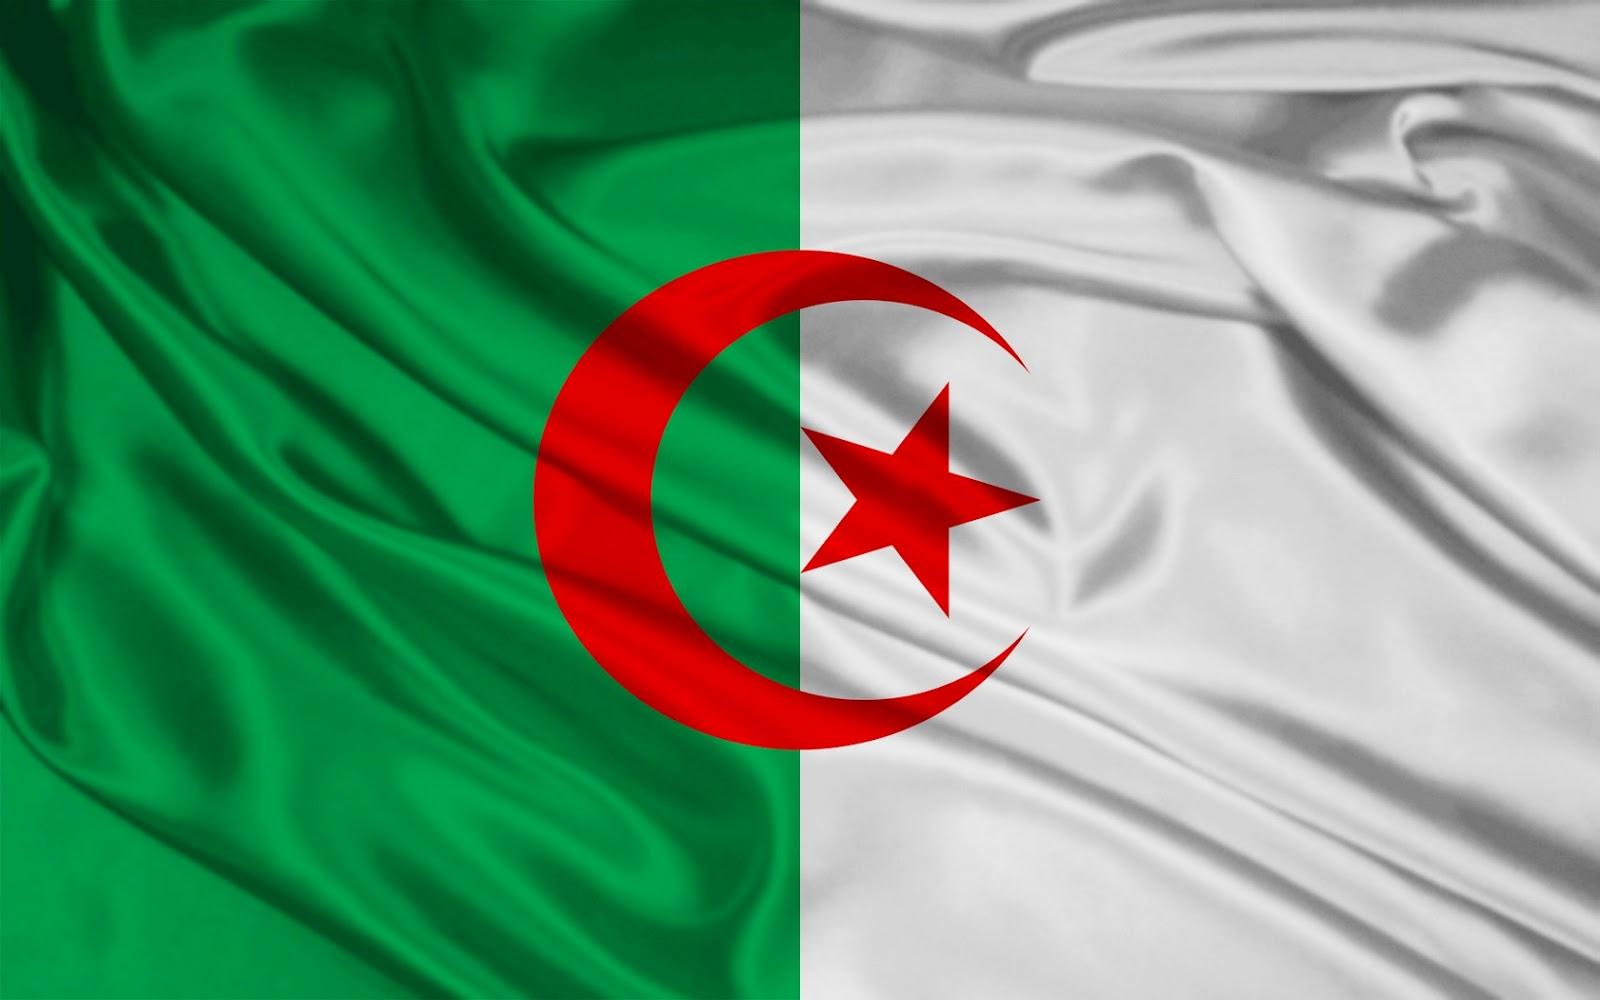 http://2.bp.blogspot.com/-WTzNE4MiJ-c/T6KFz87KRdI/AAAAAAAAAEc/LZ0ryR1BblE/s1600/Algeria-Flag-Wallpapers-1680x1050.jpg